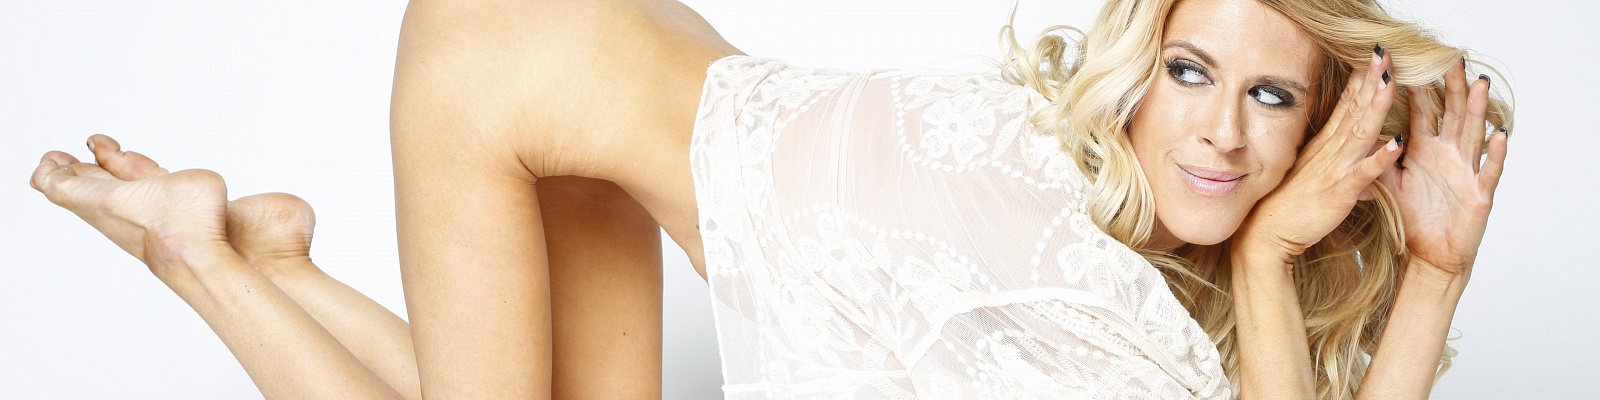 Lana Love's Cover Photo